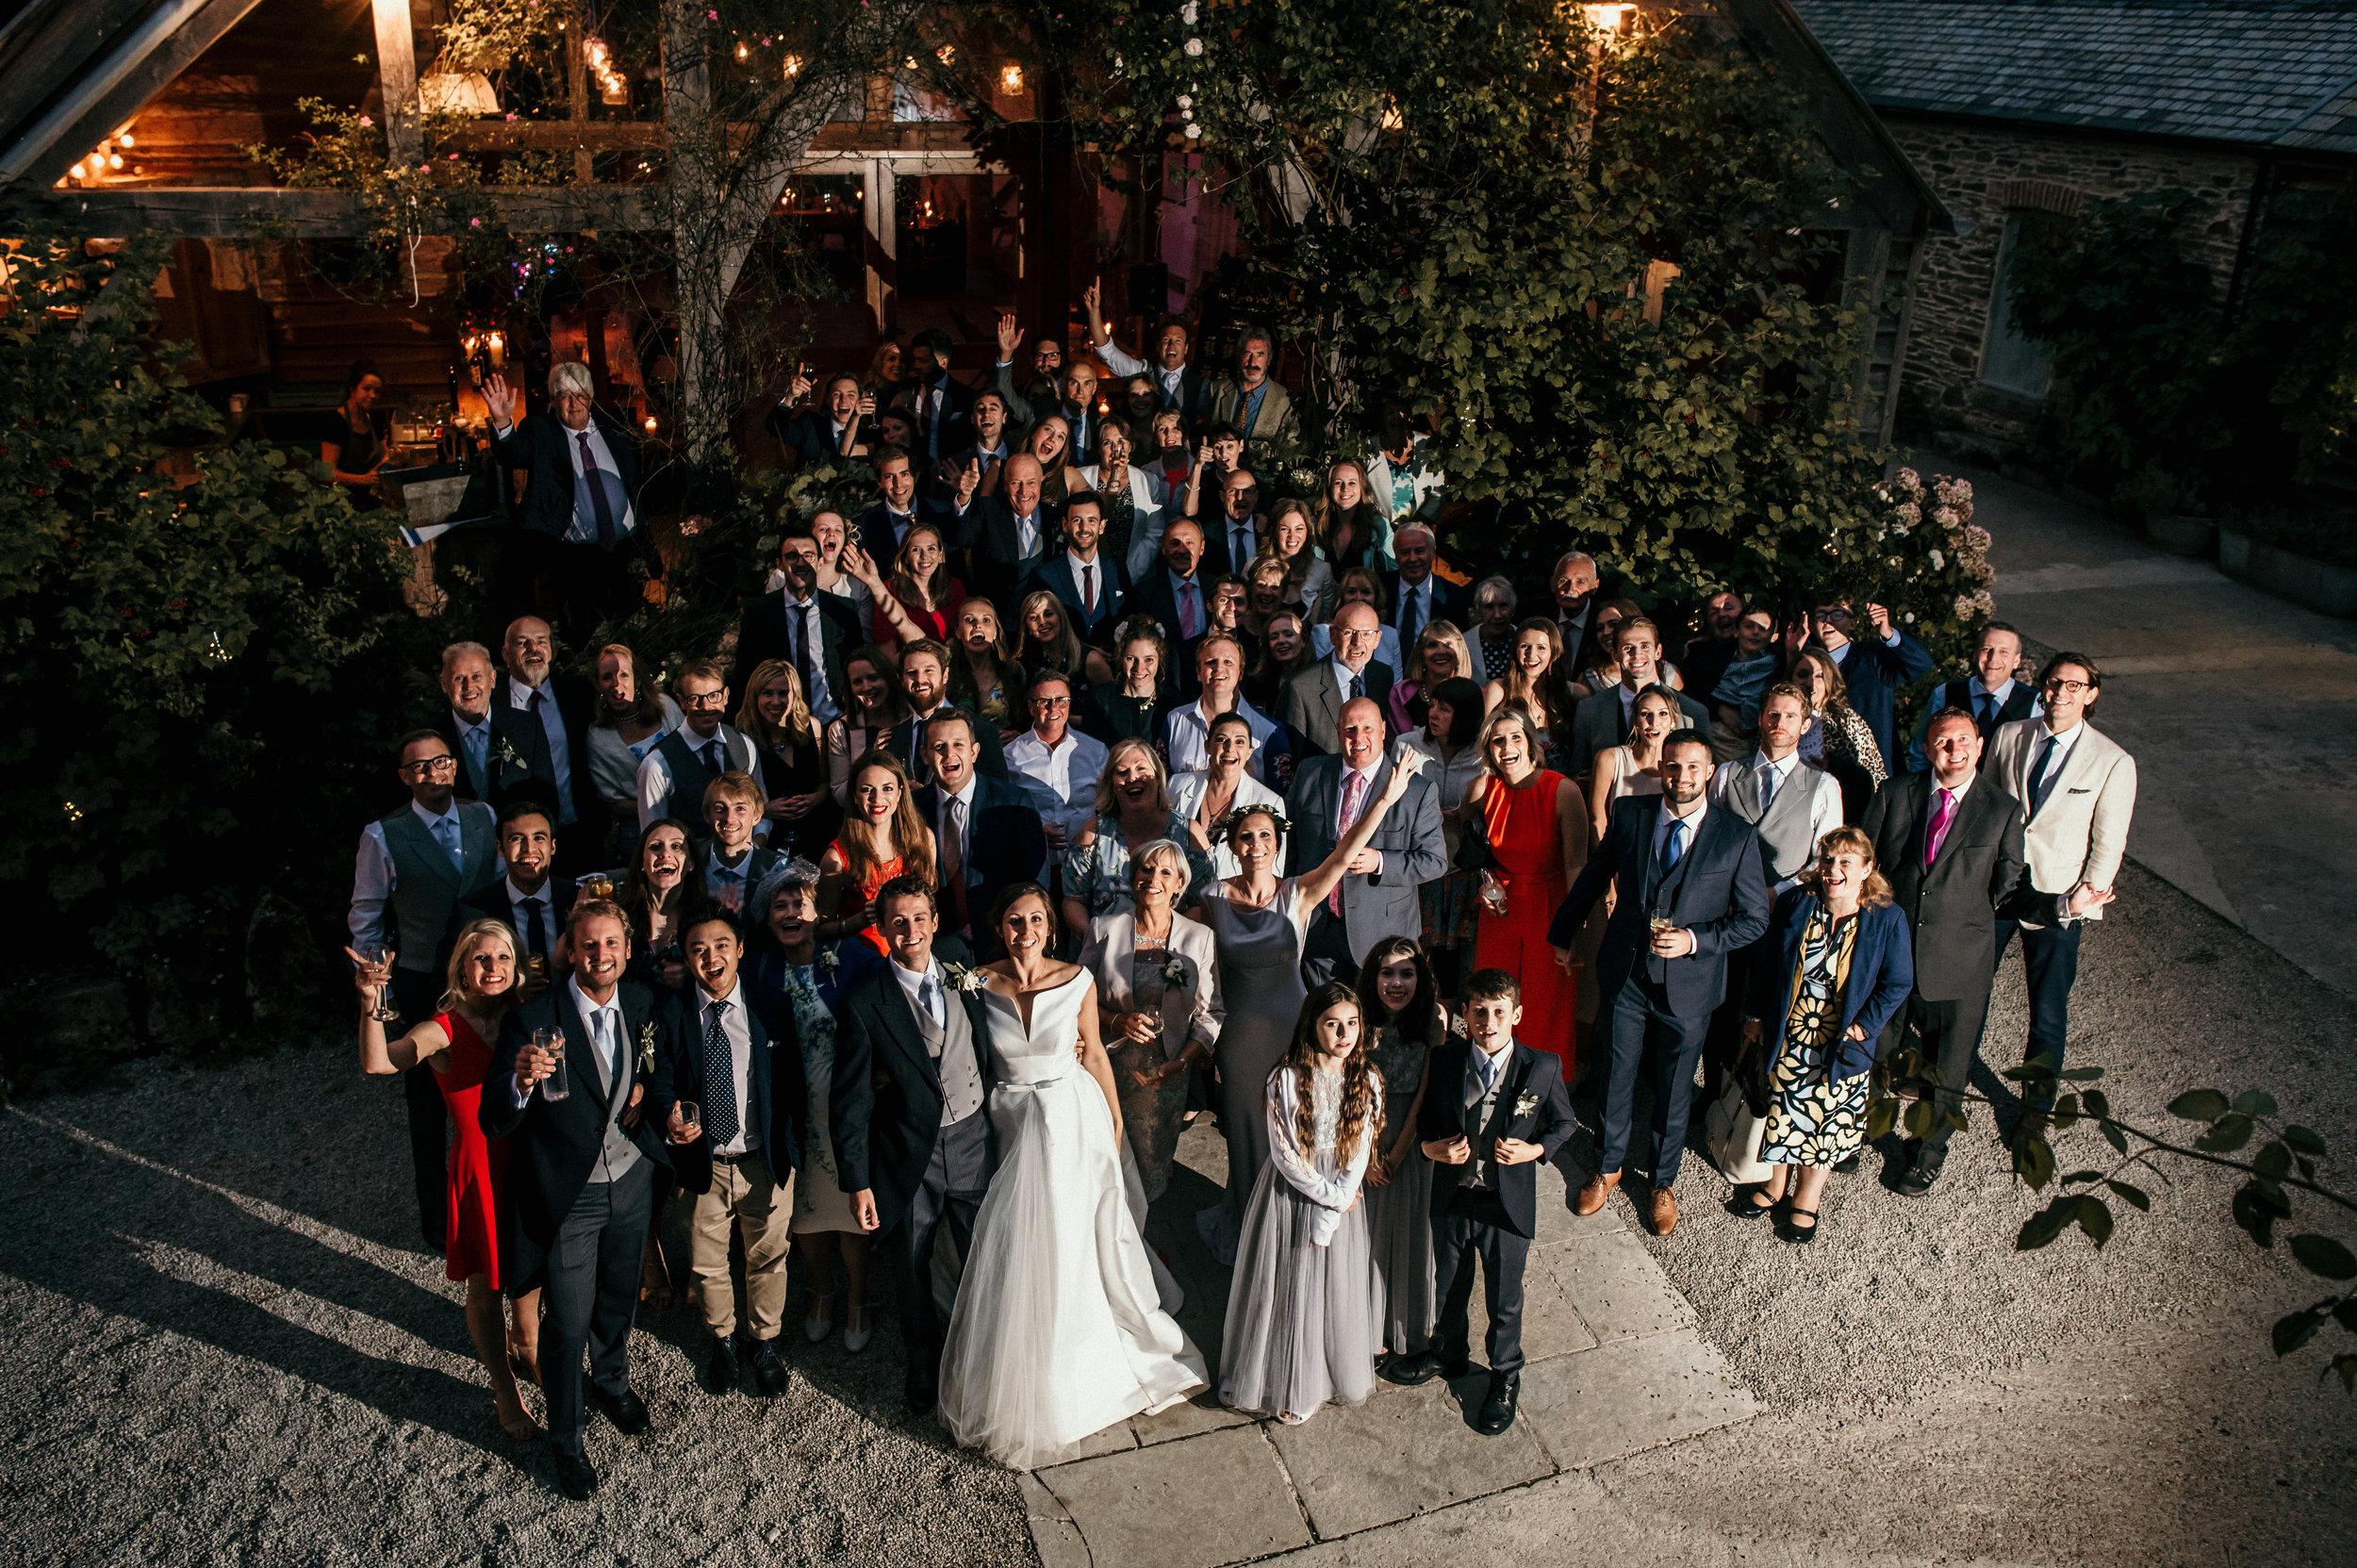 nancarrow-farm-wedding-photographer-cornwall-60.jpg